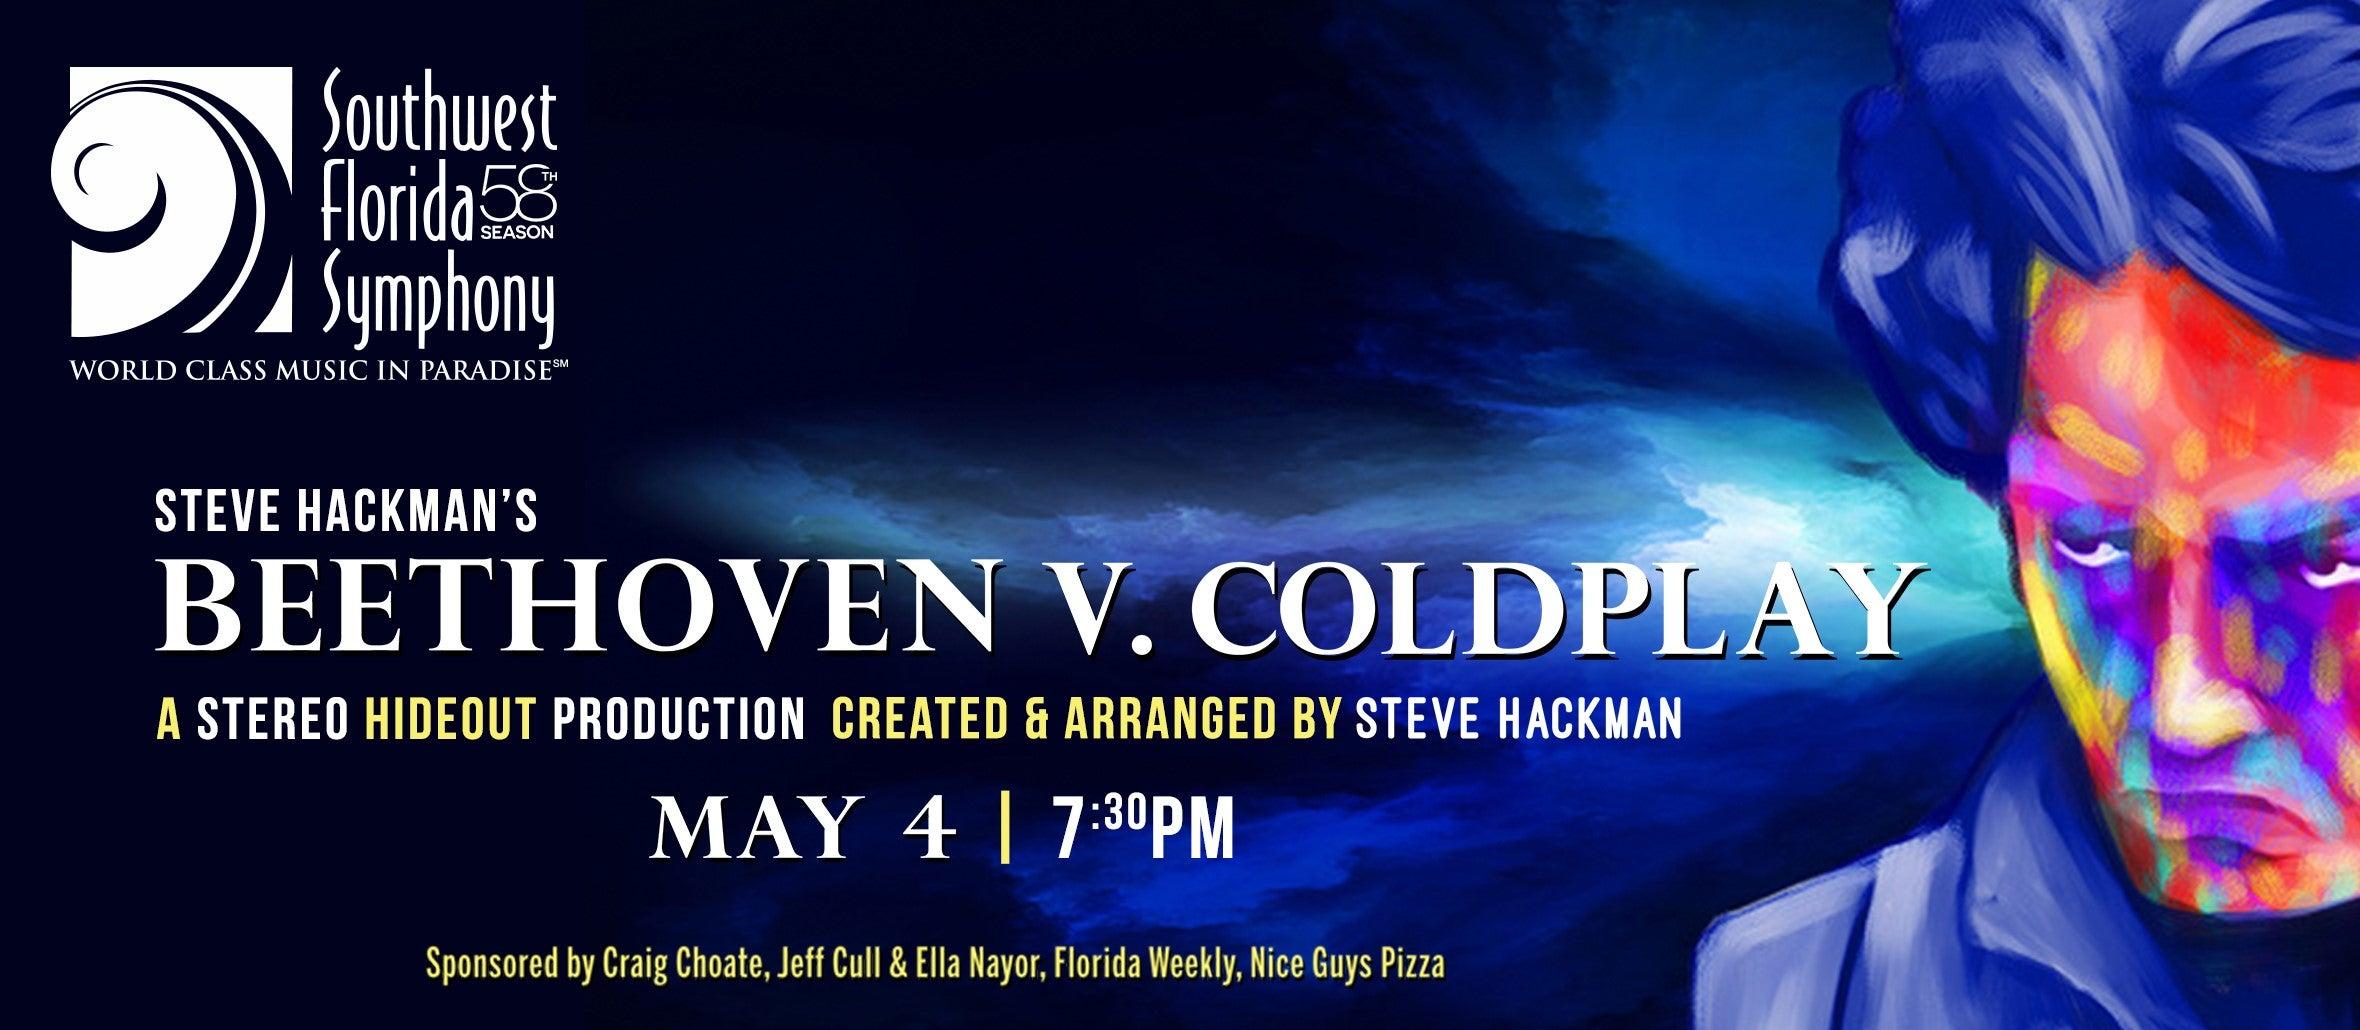 Southwest Florida Symphony: Beethoven v. Coldplay